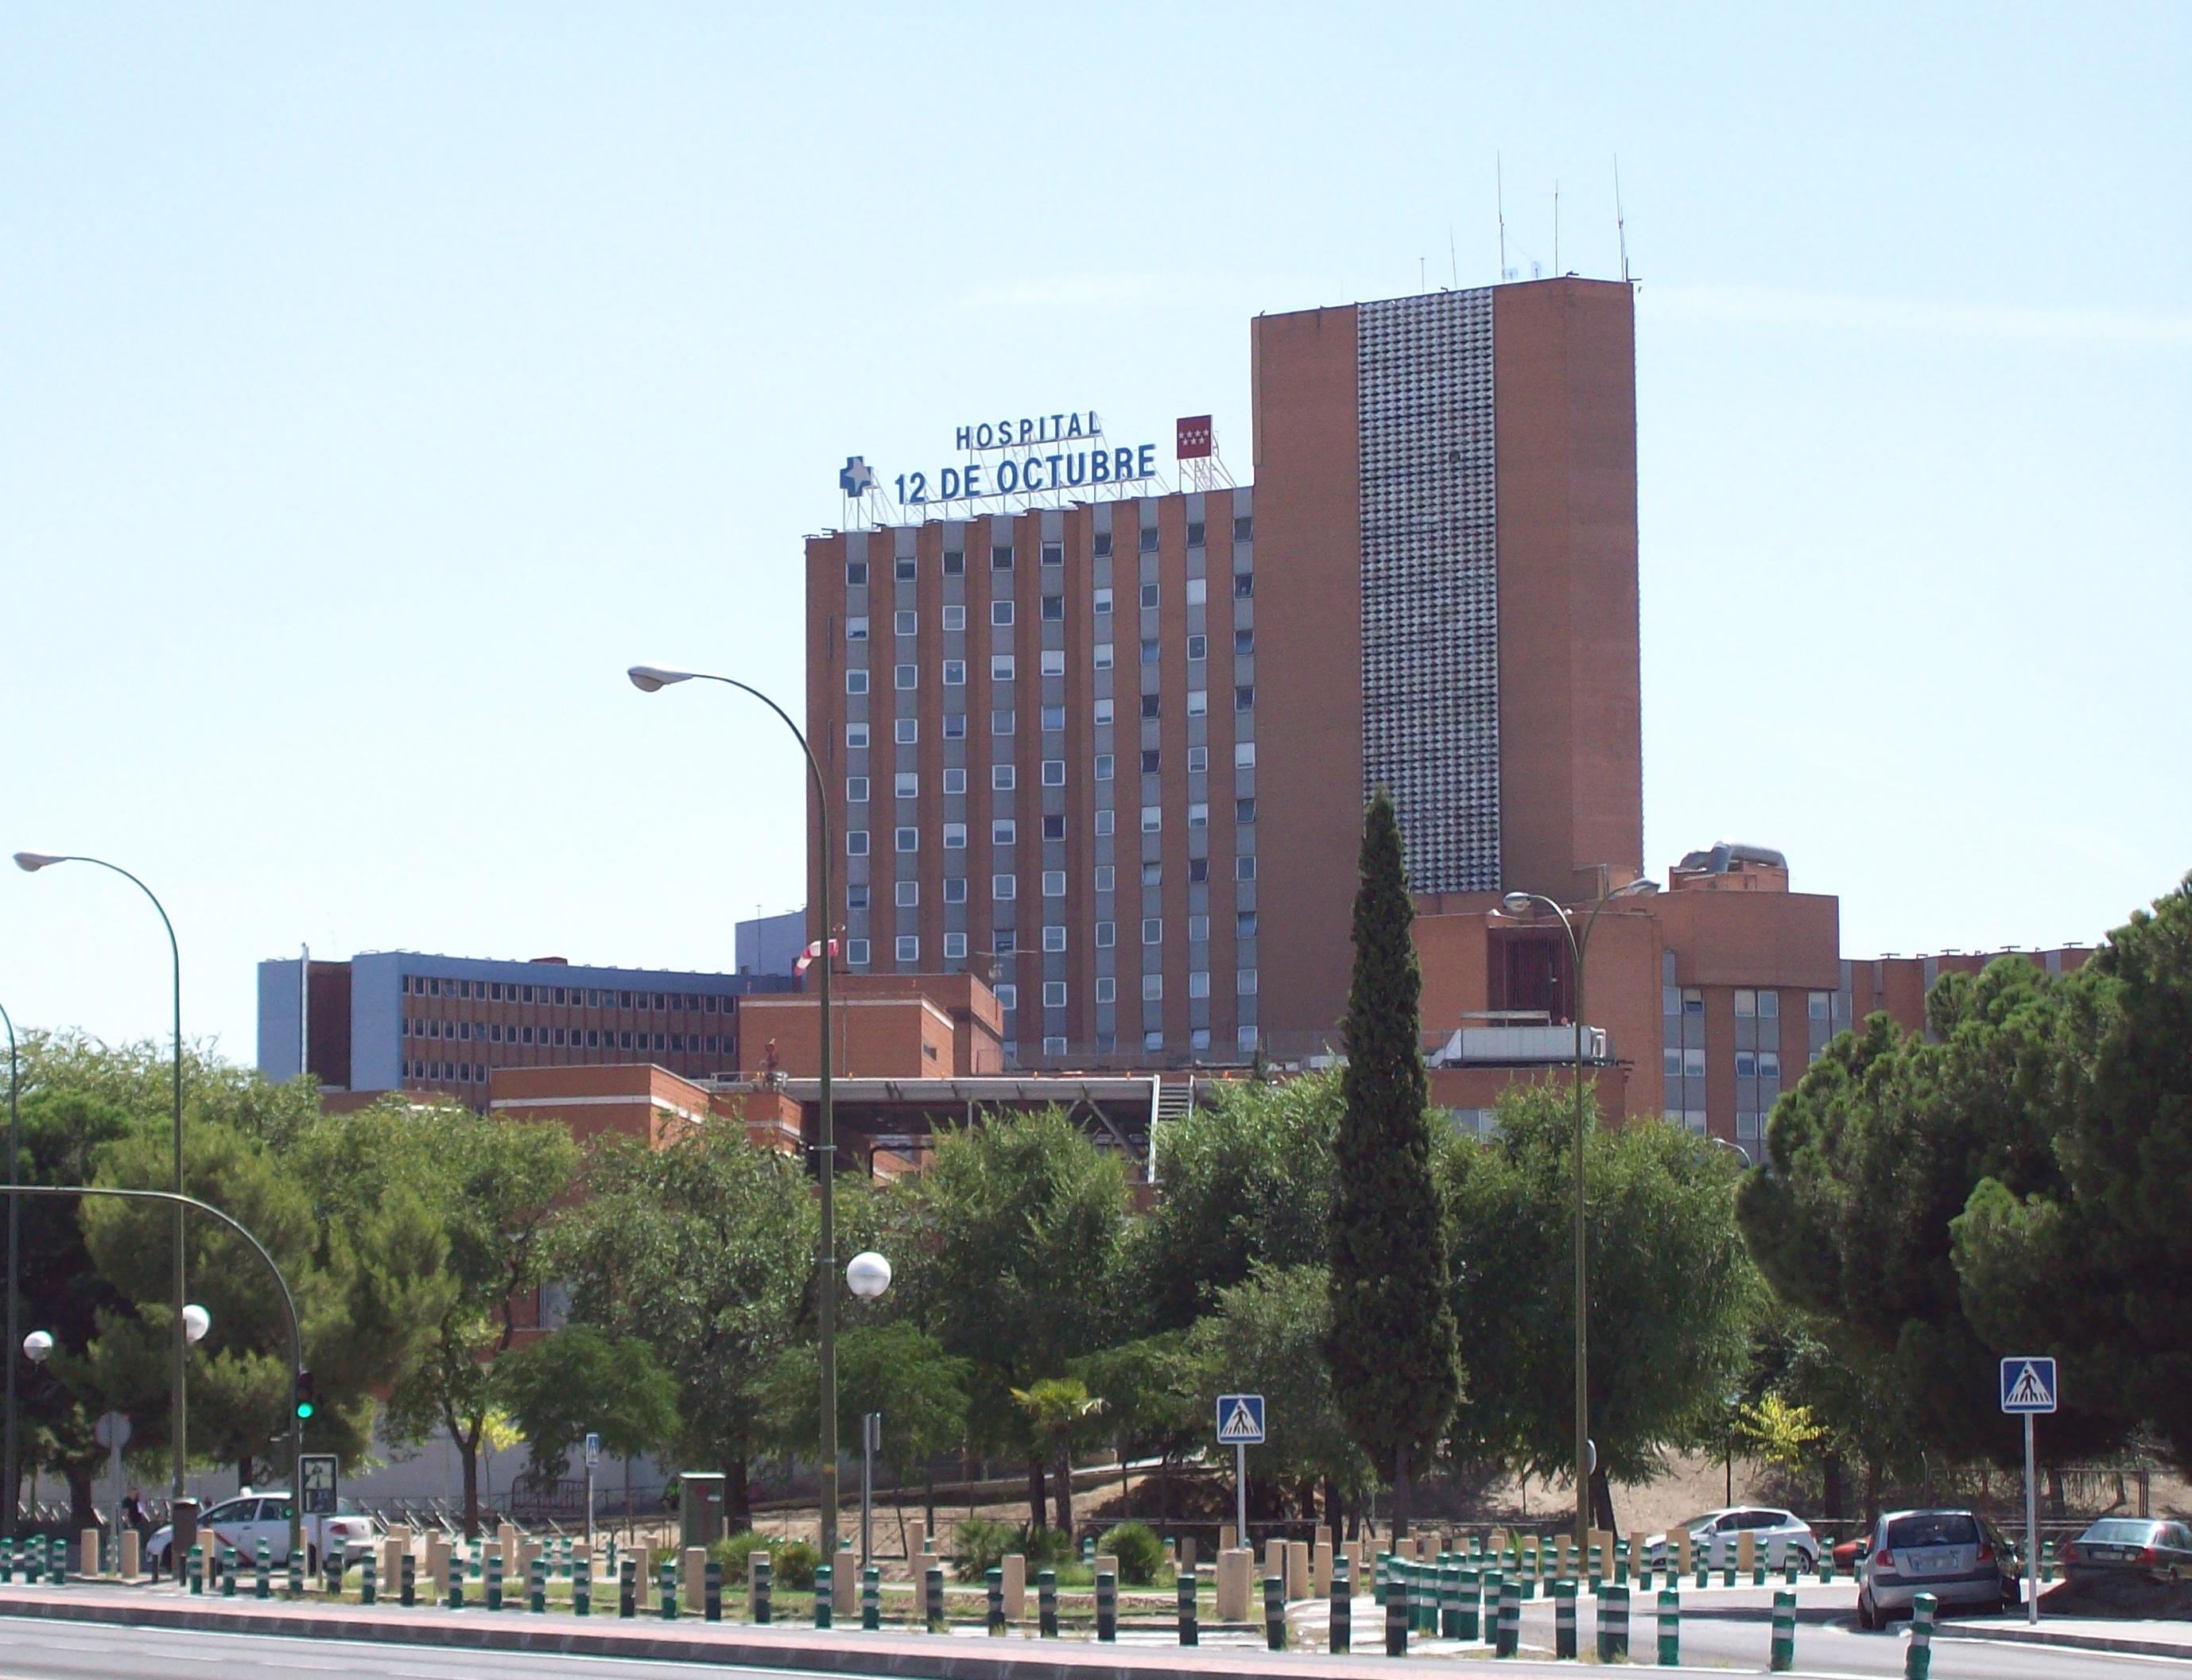 File:Hospital 12 de Octubre (Madrid) 01.jpg - Wikimedia ...